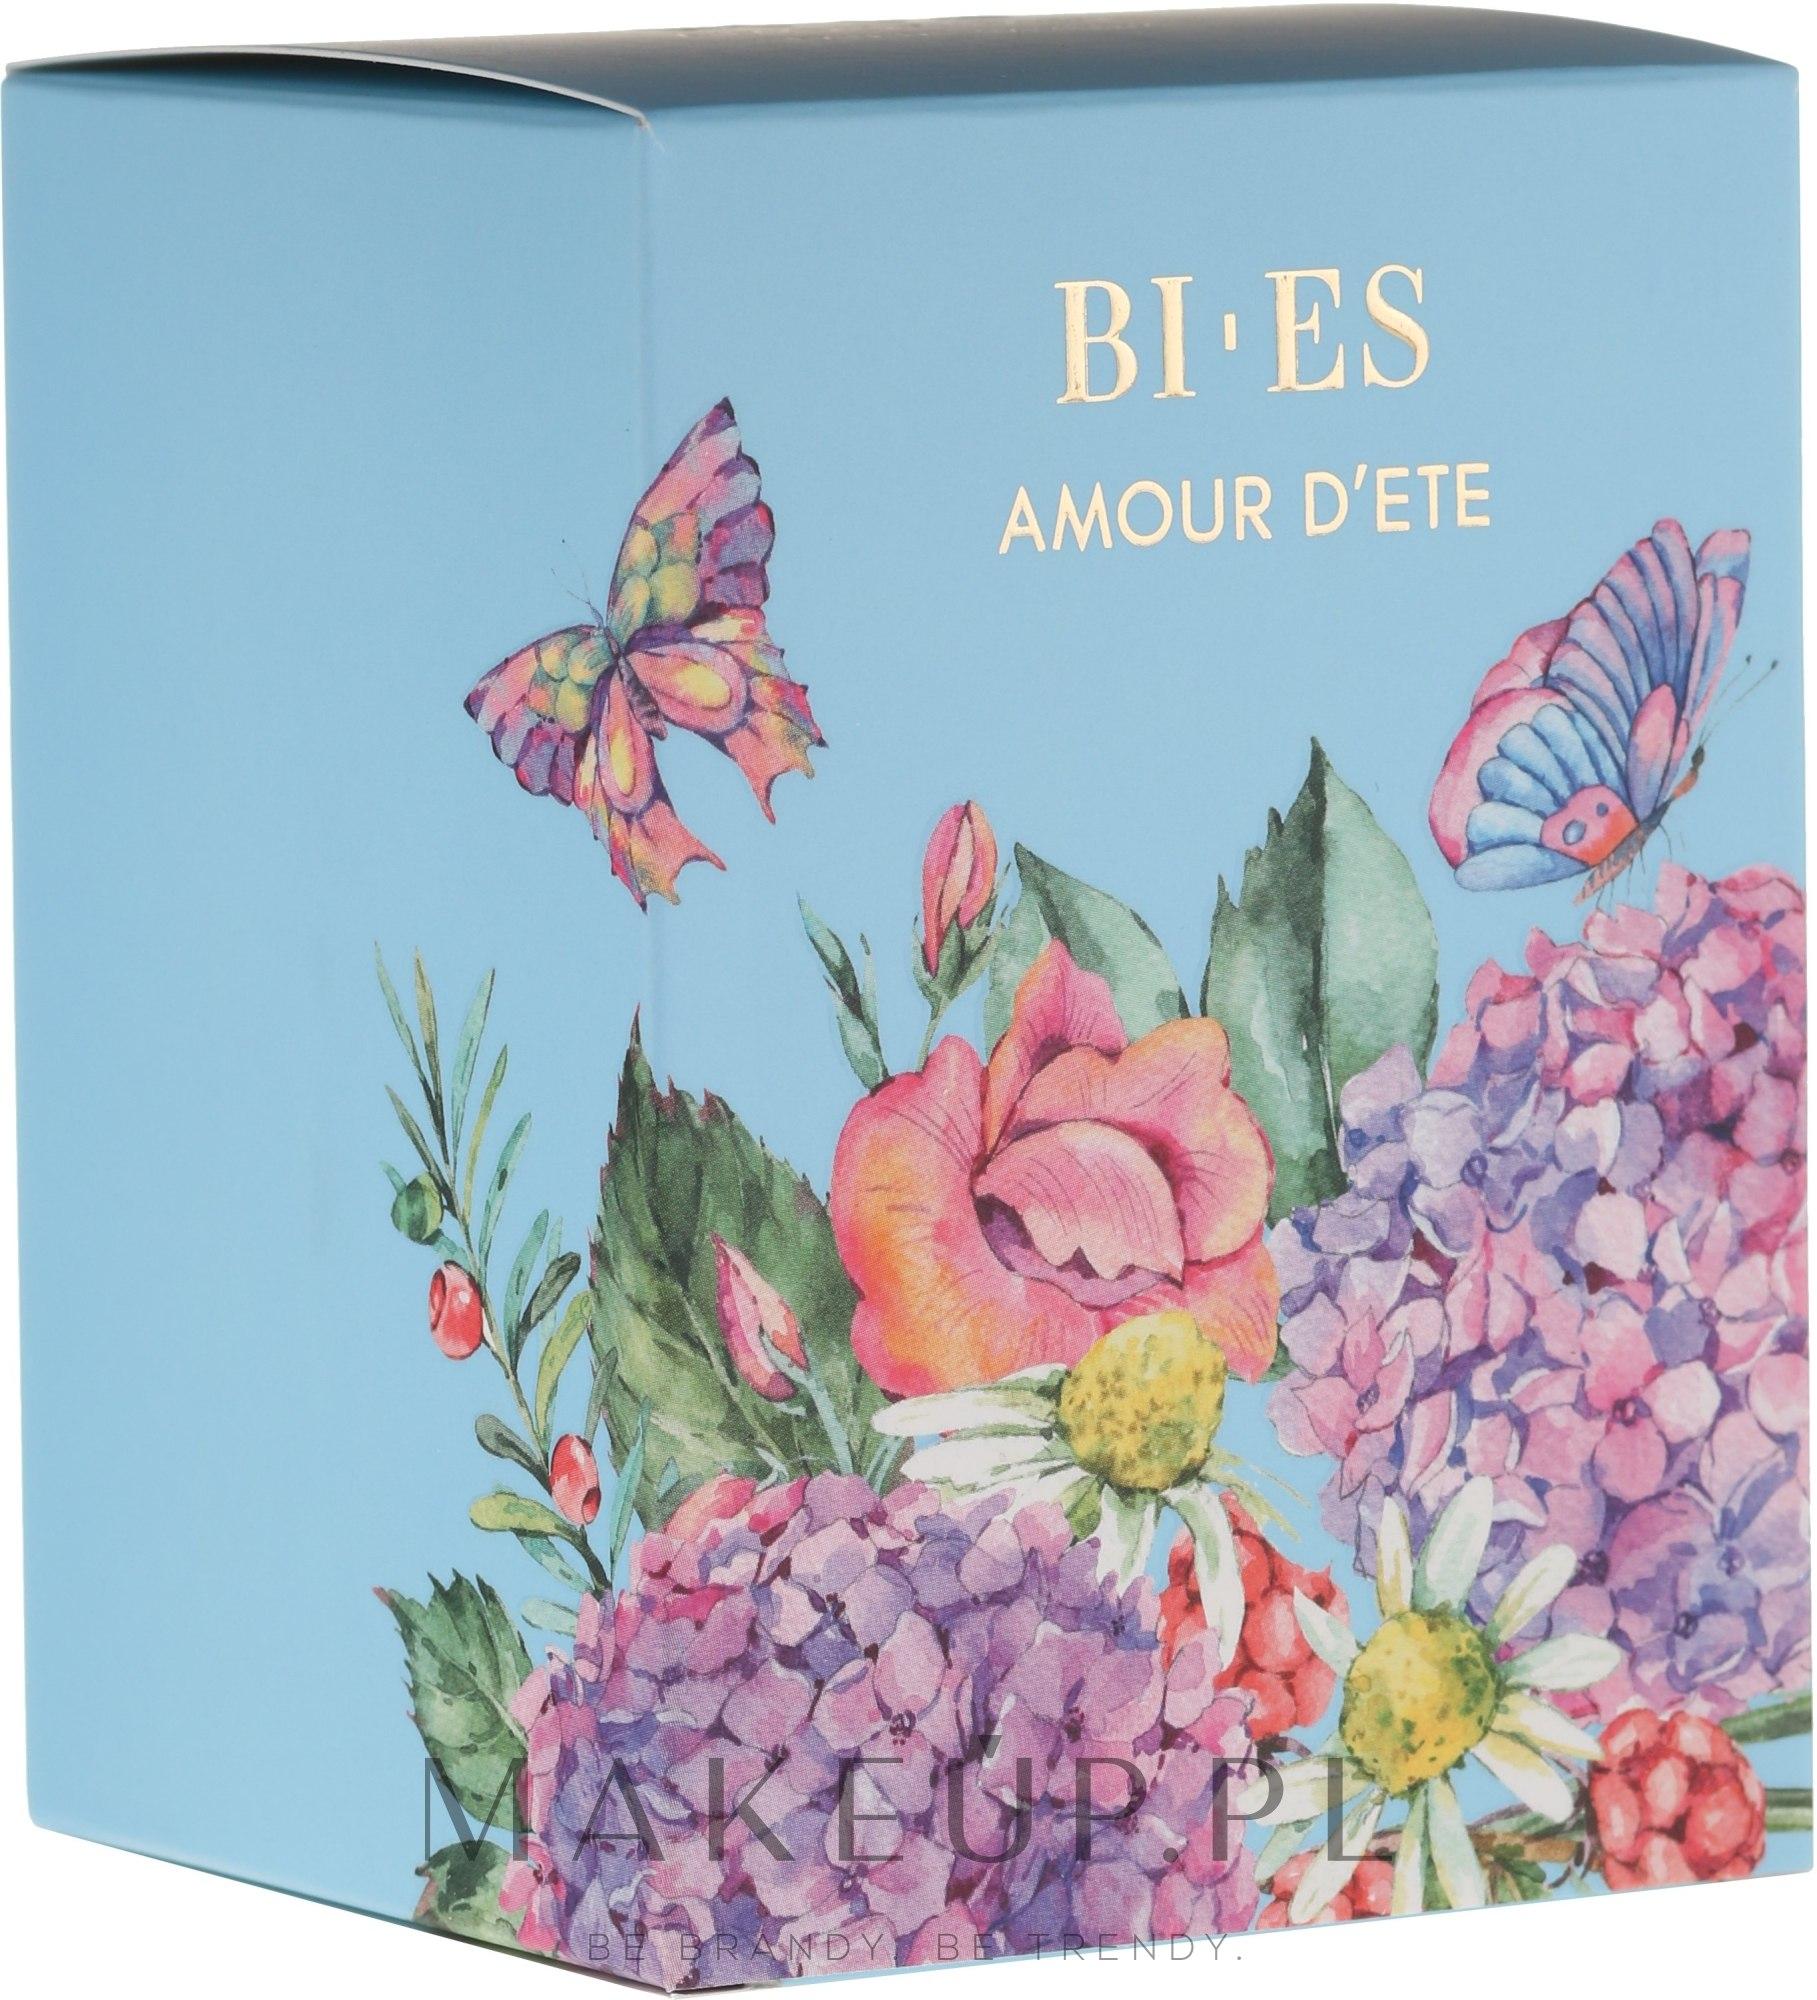 bi-es mon amour